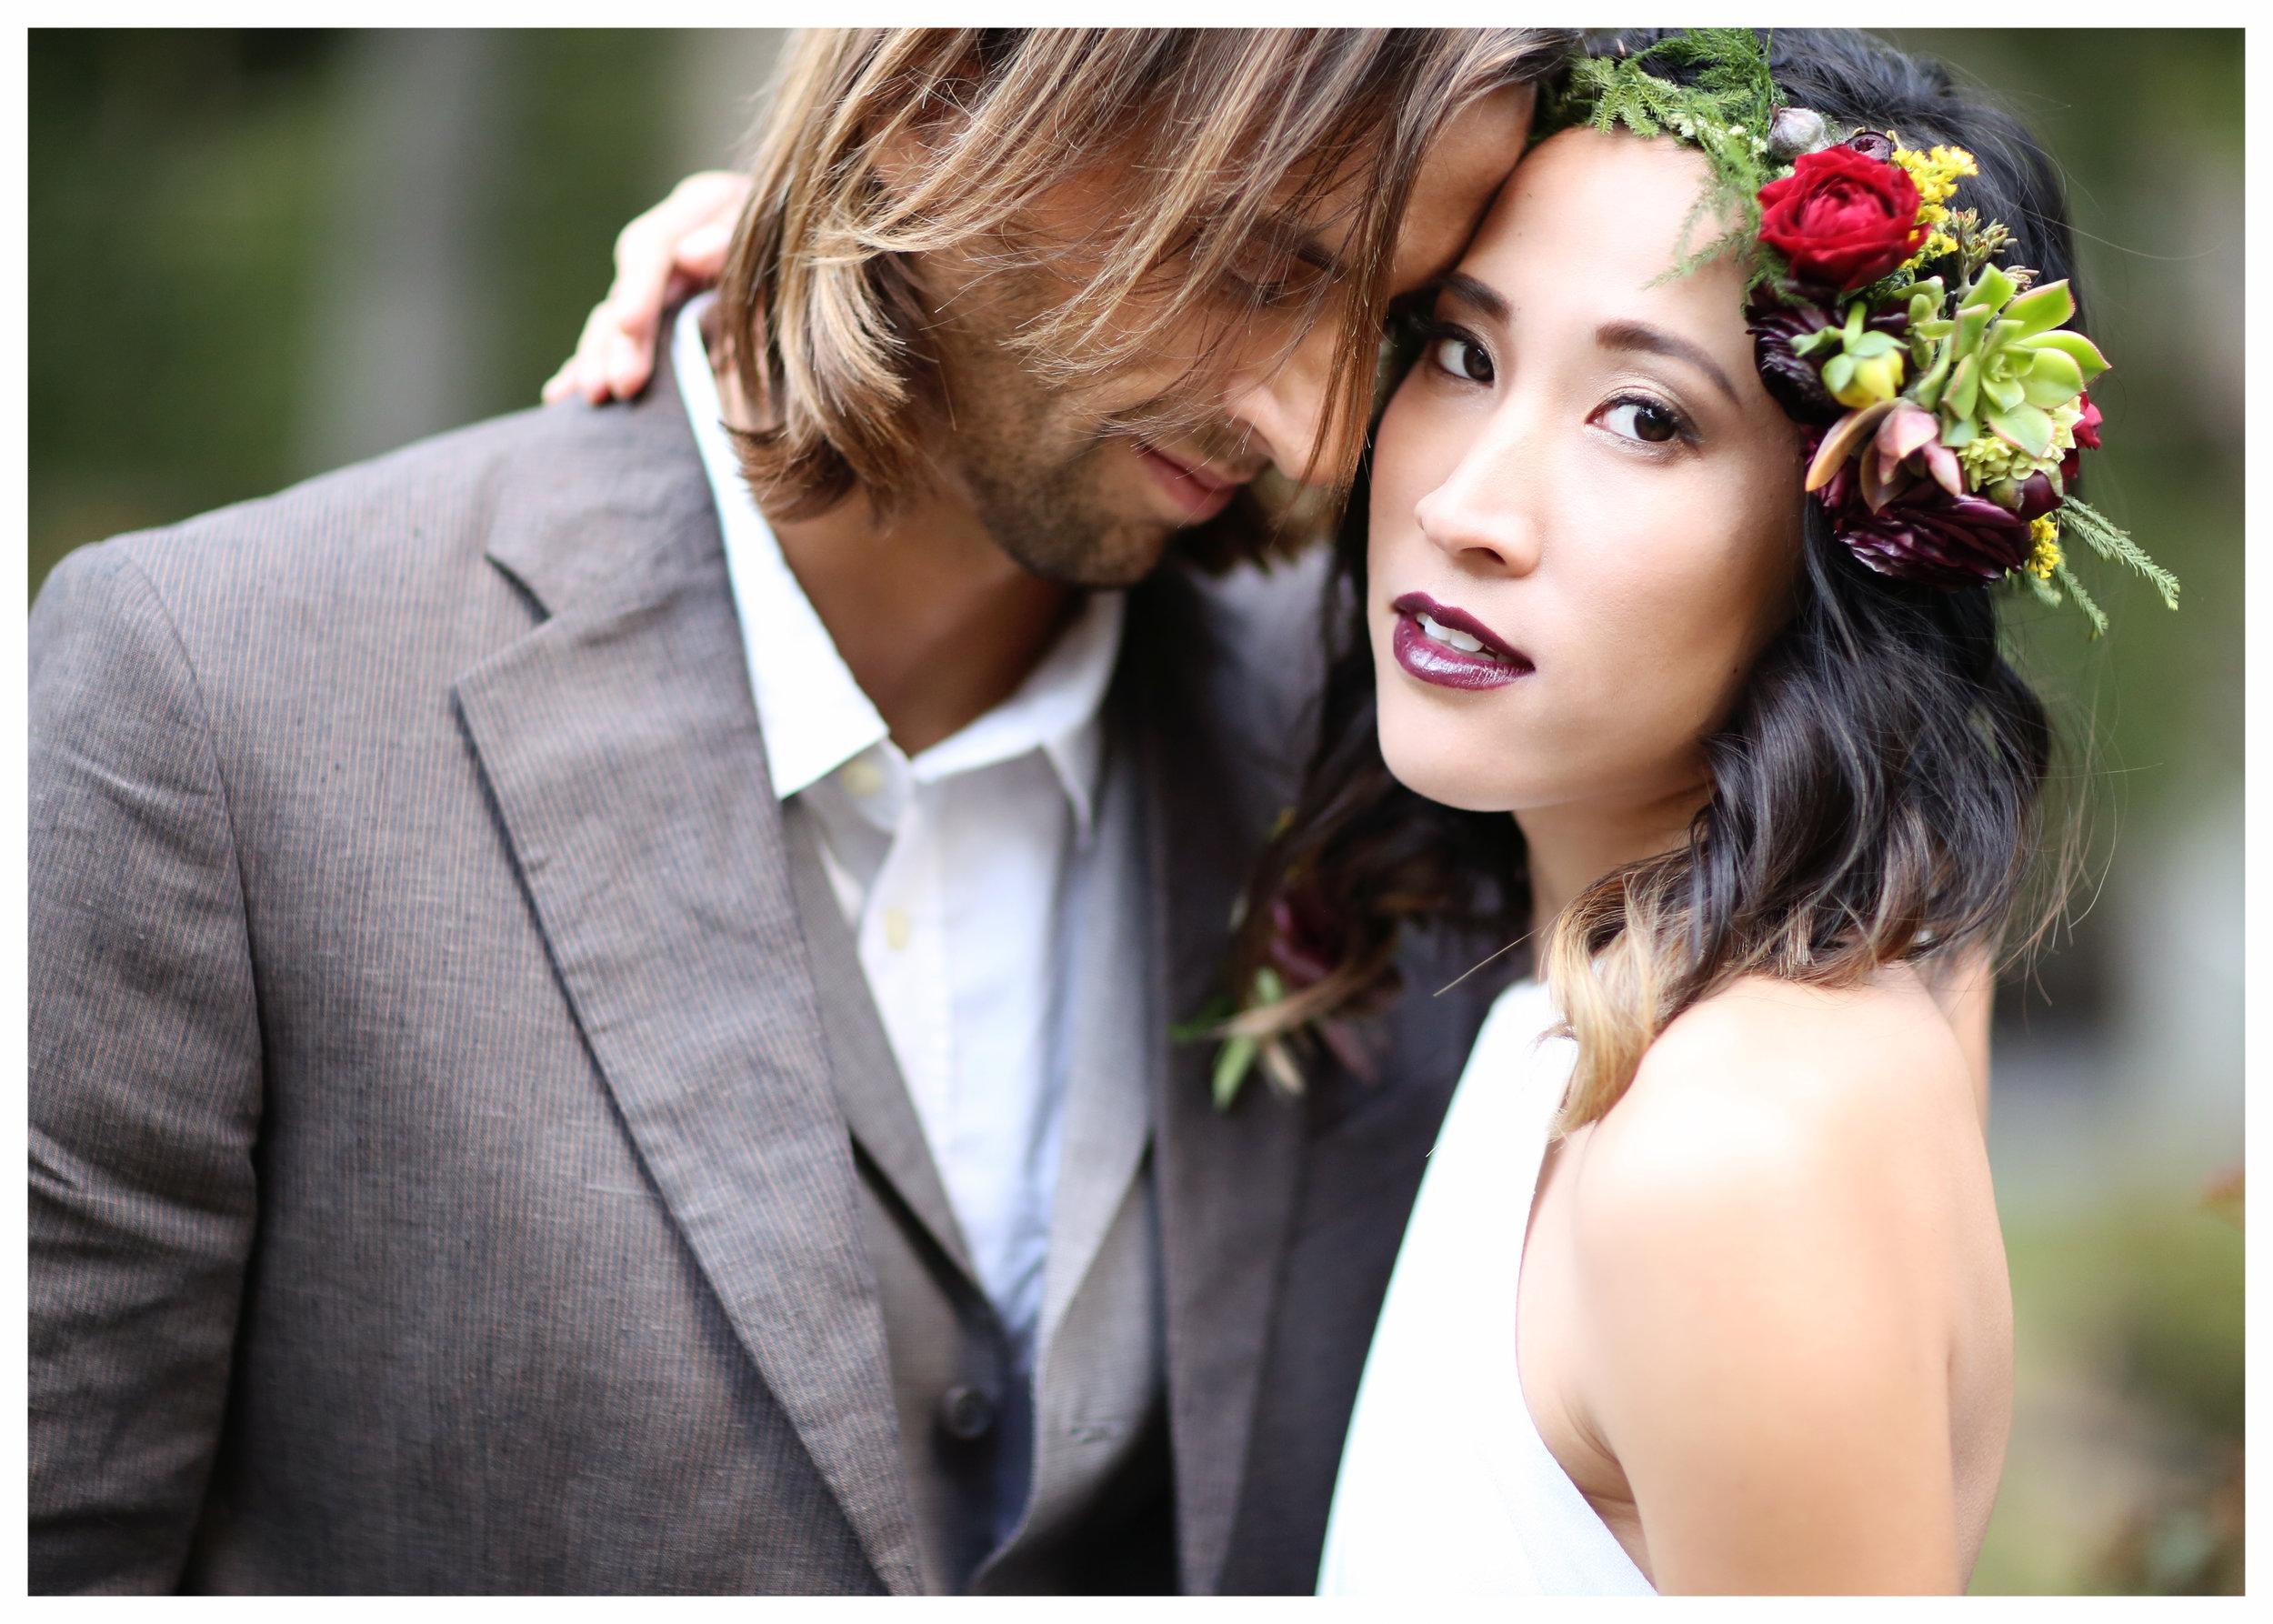 Boho bride and groom wedding photo in Orange County. Organic fine art image.